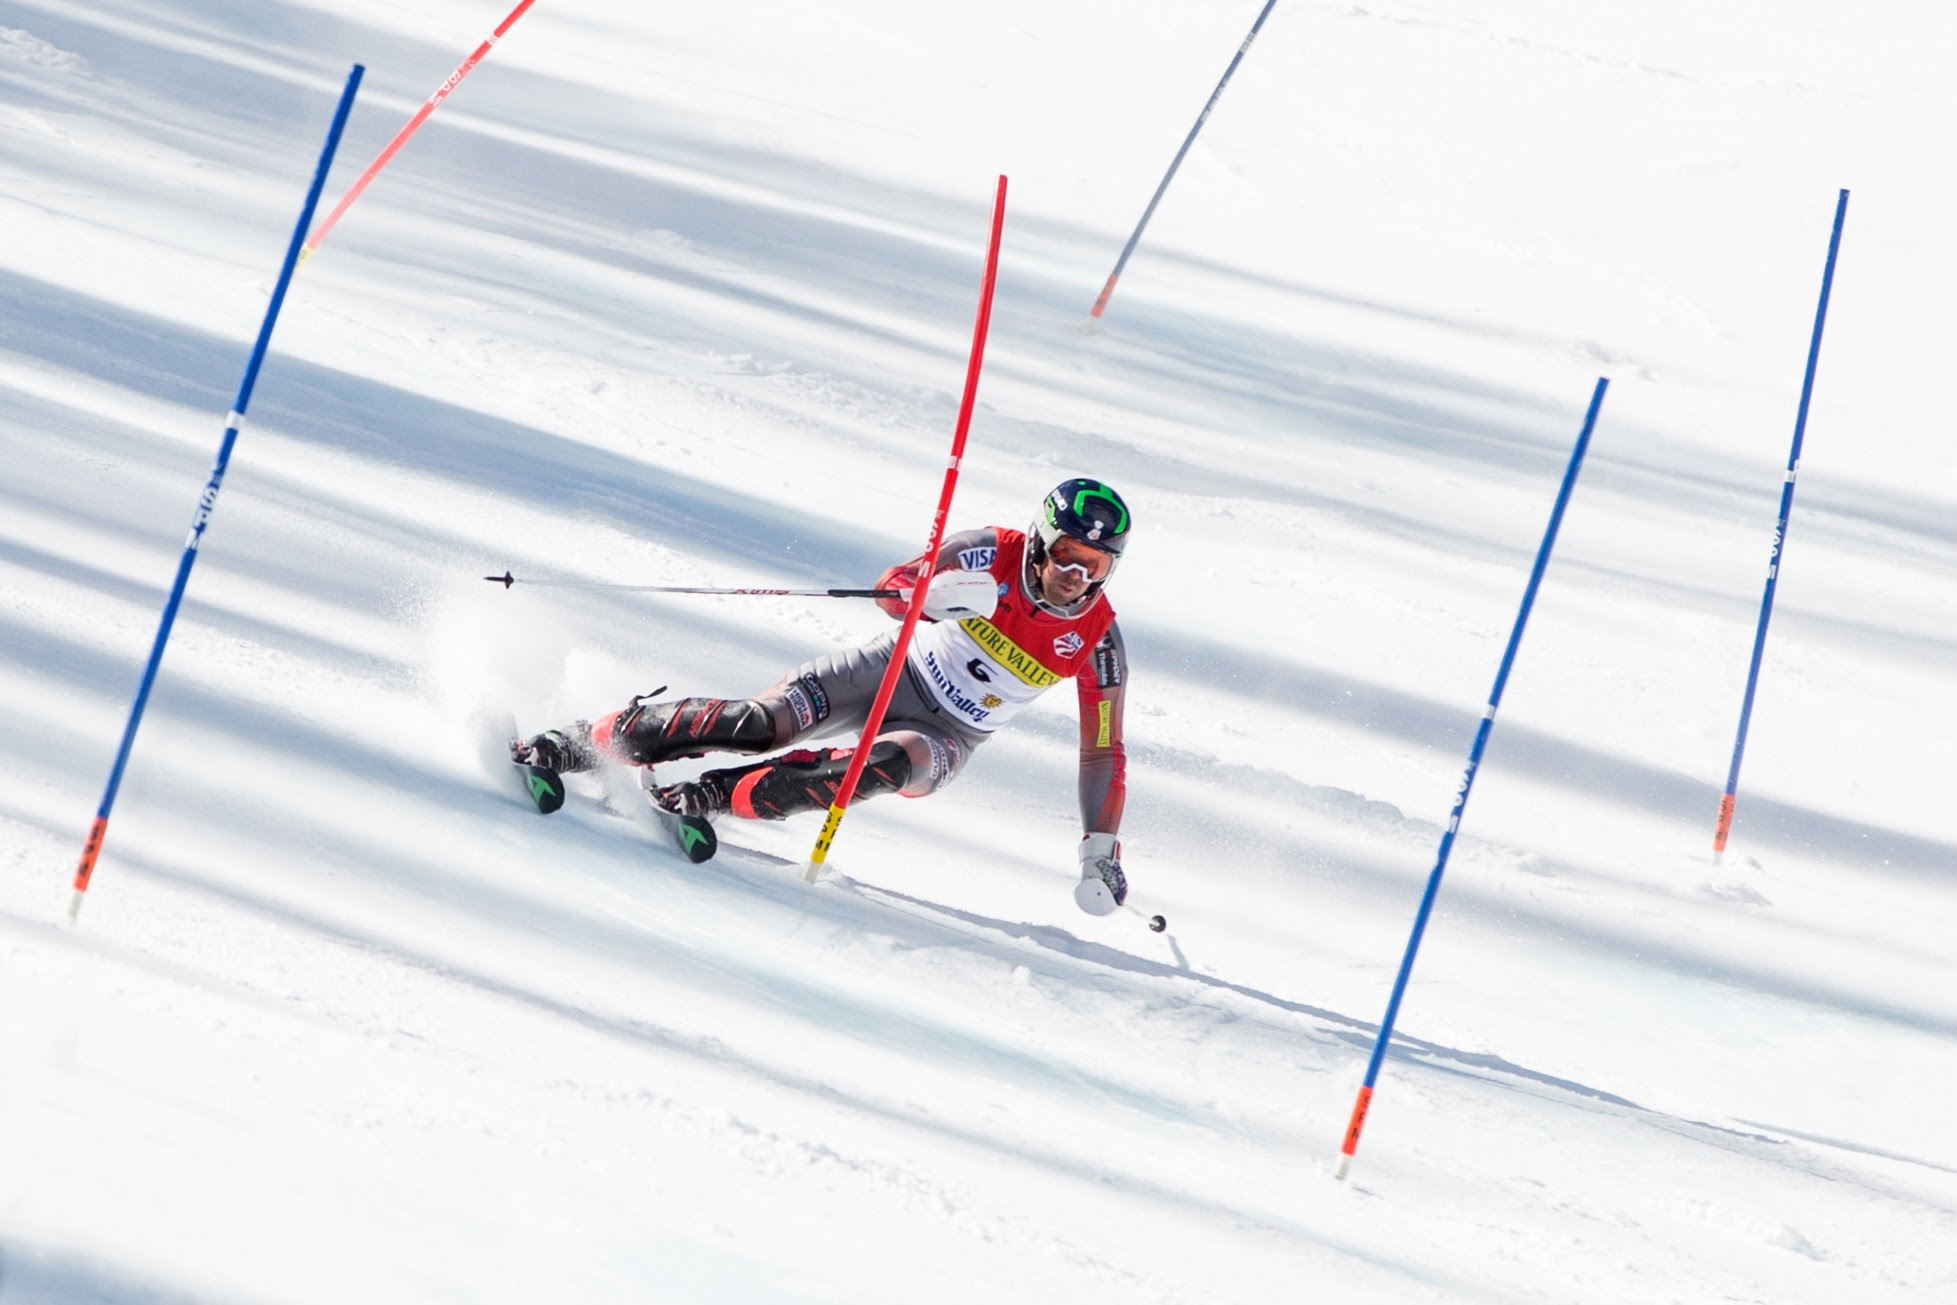 SUN VALLEY, ID (March 25, 2016) – David Chodounsky's winning slalom runs at the 2016 U.S. Alpine Championships in Sun Valley, Idaho.